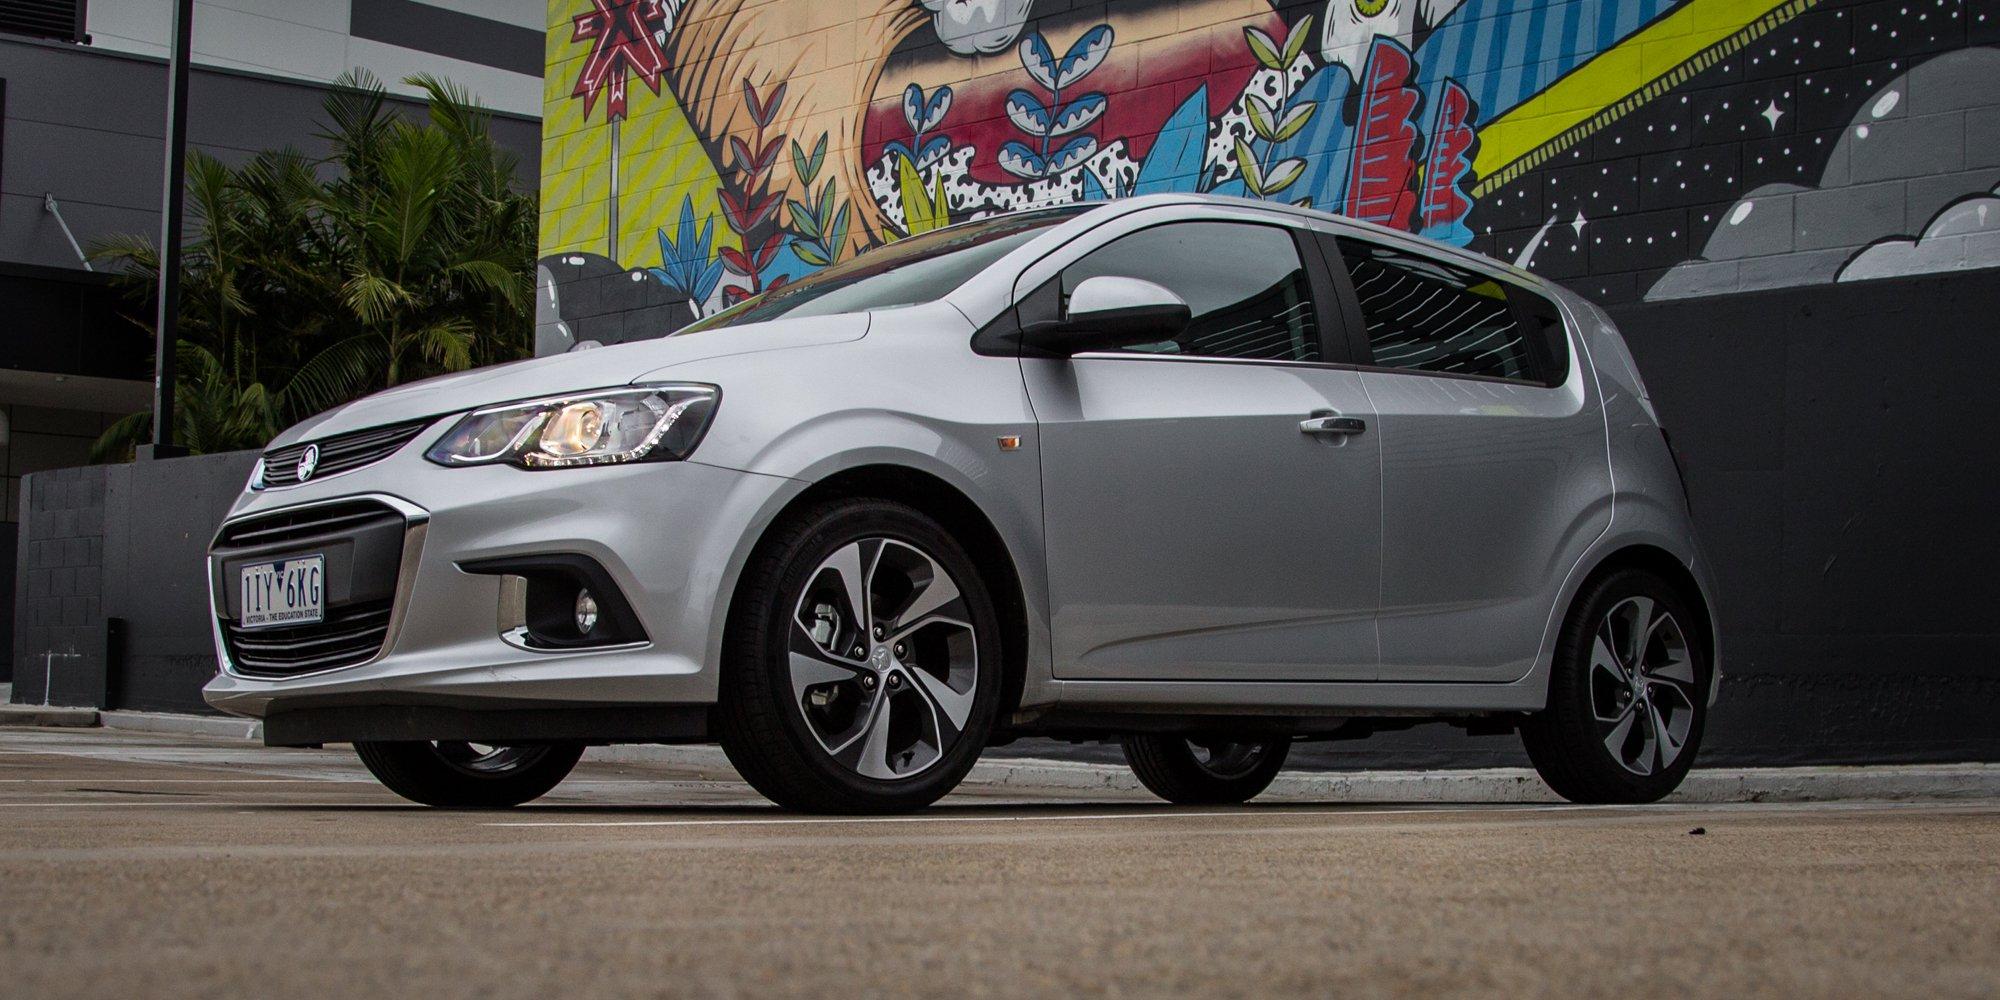 2017 Holden Barina LT review | CarAdvice